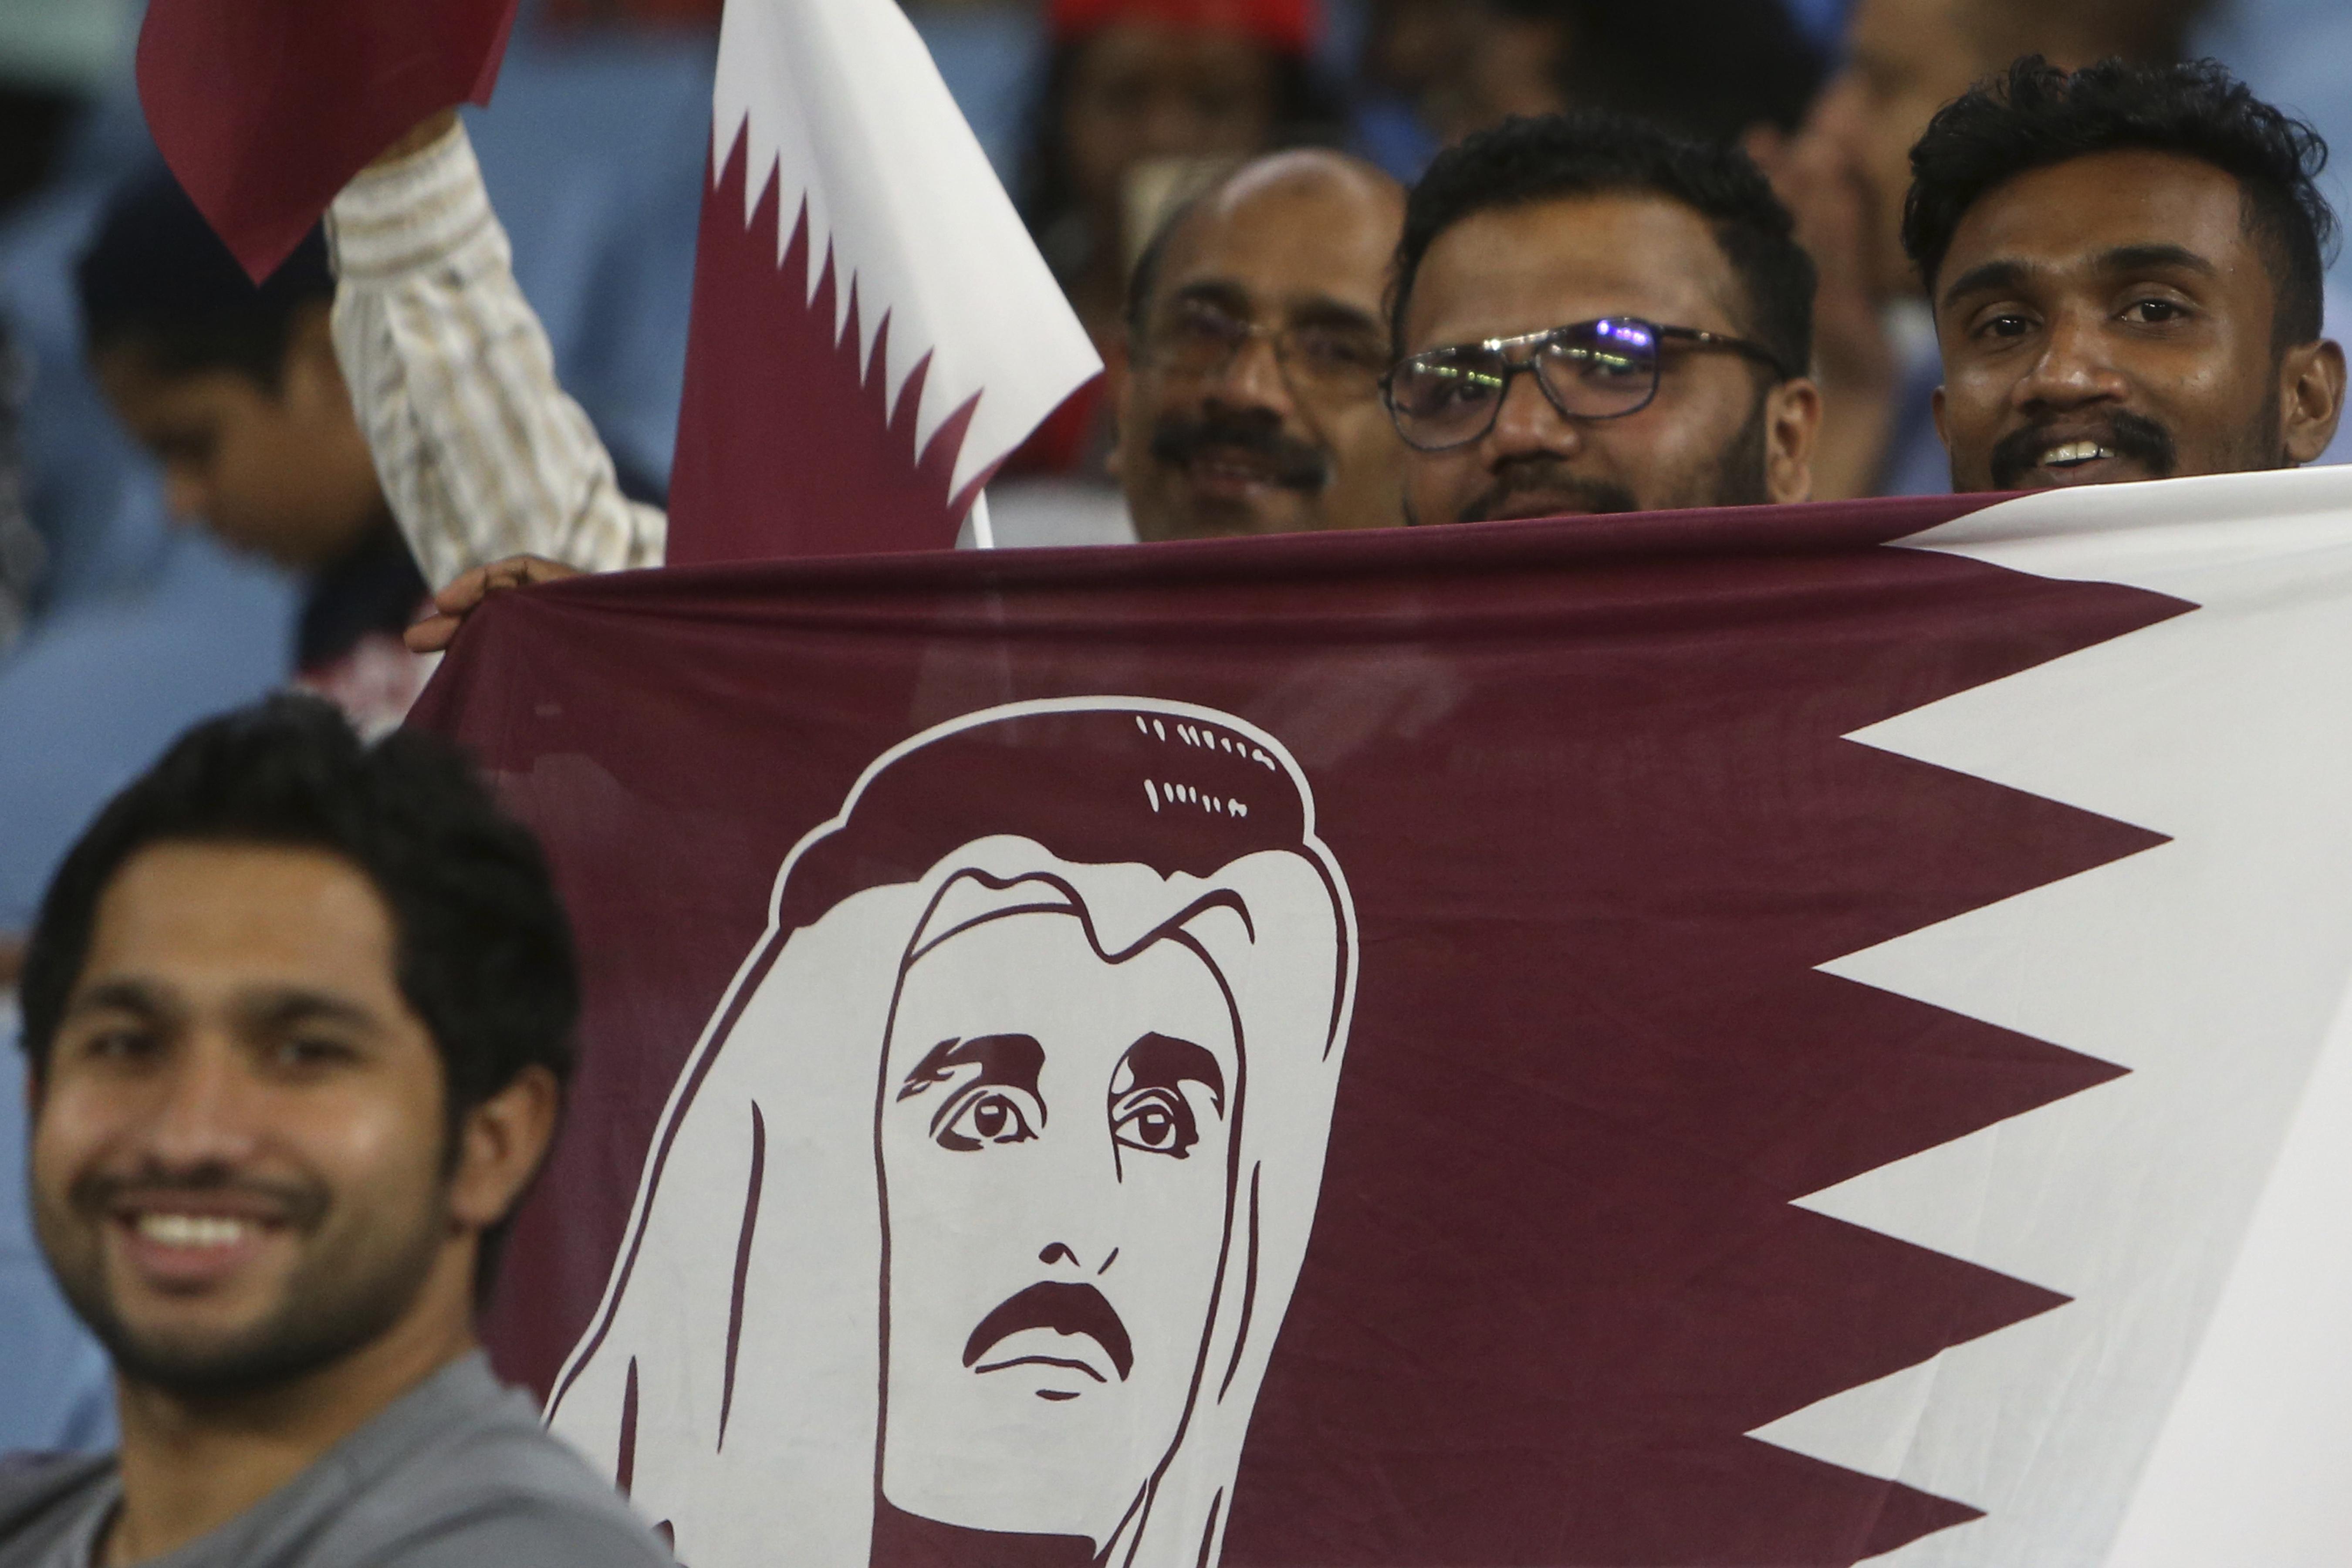 Qatar Oman Soccer